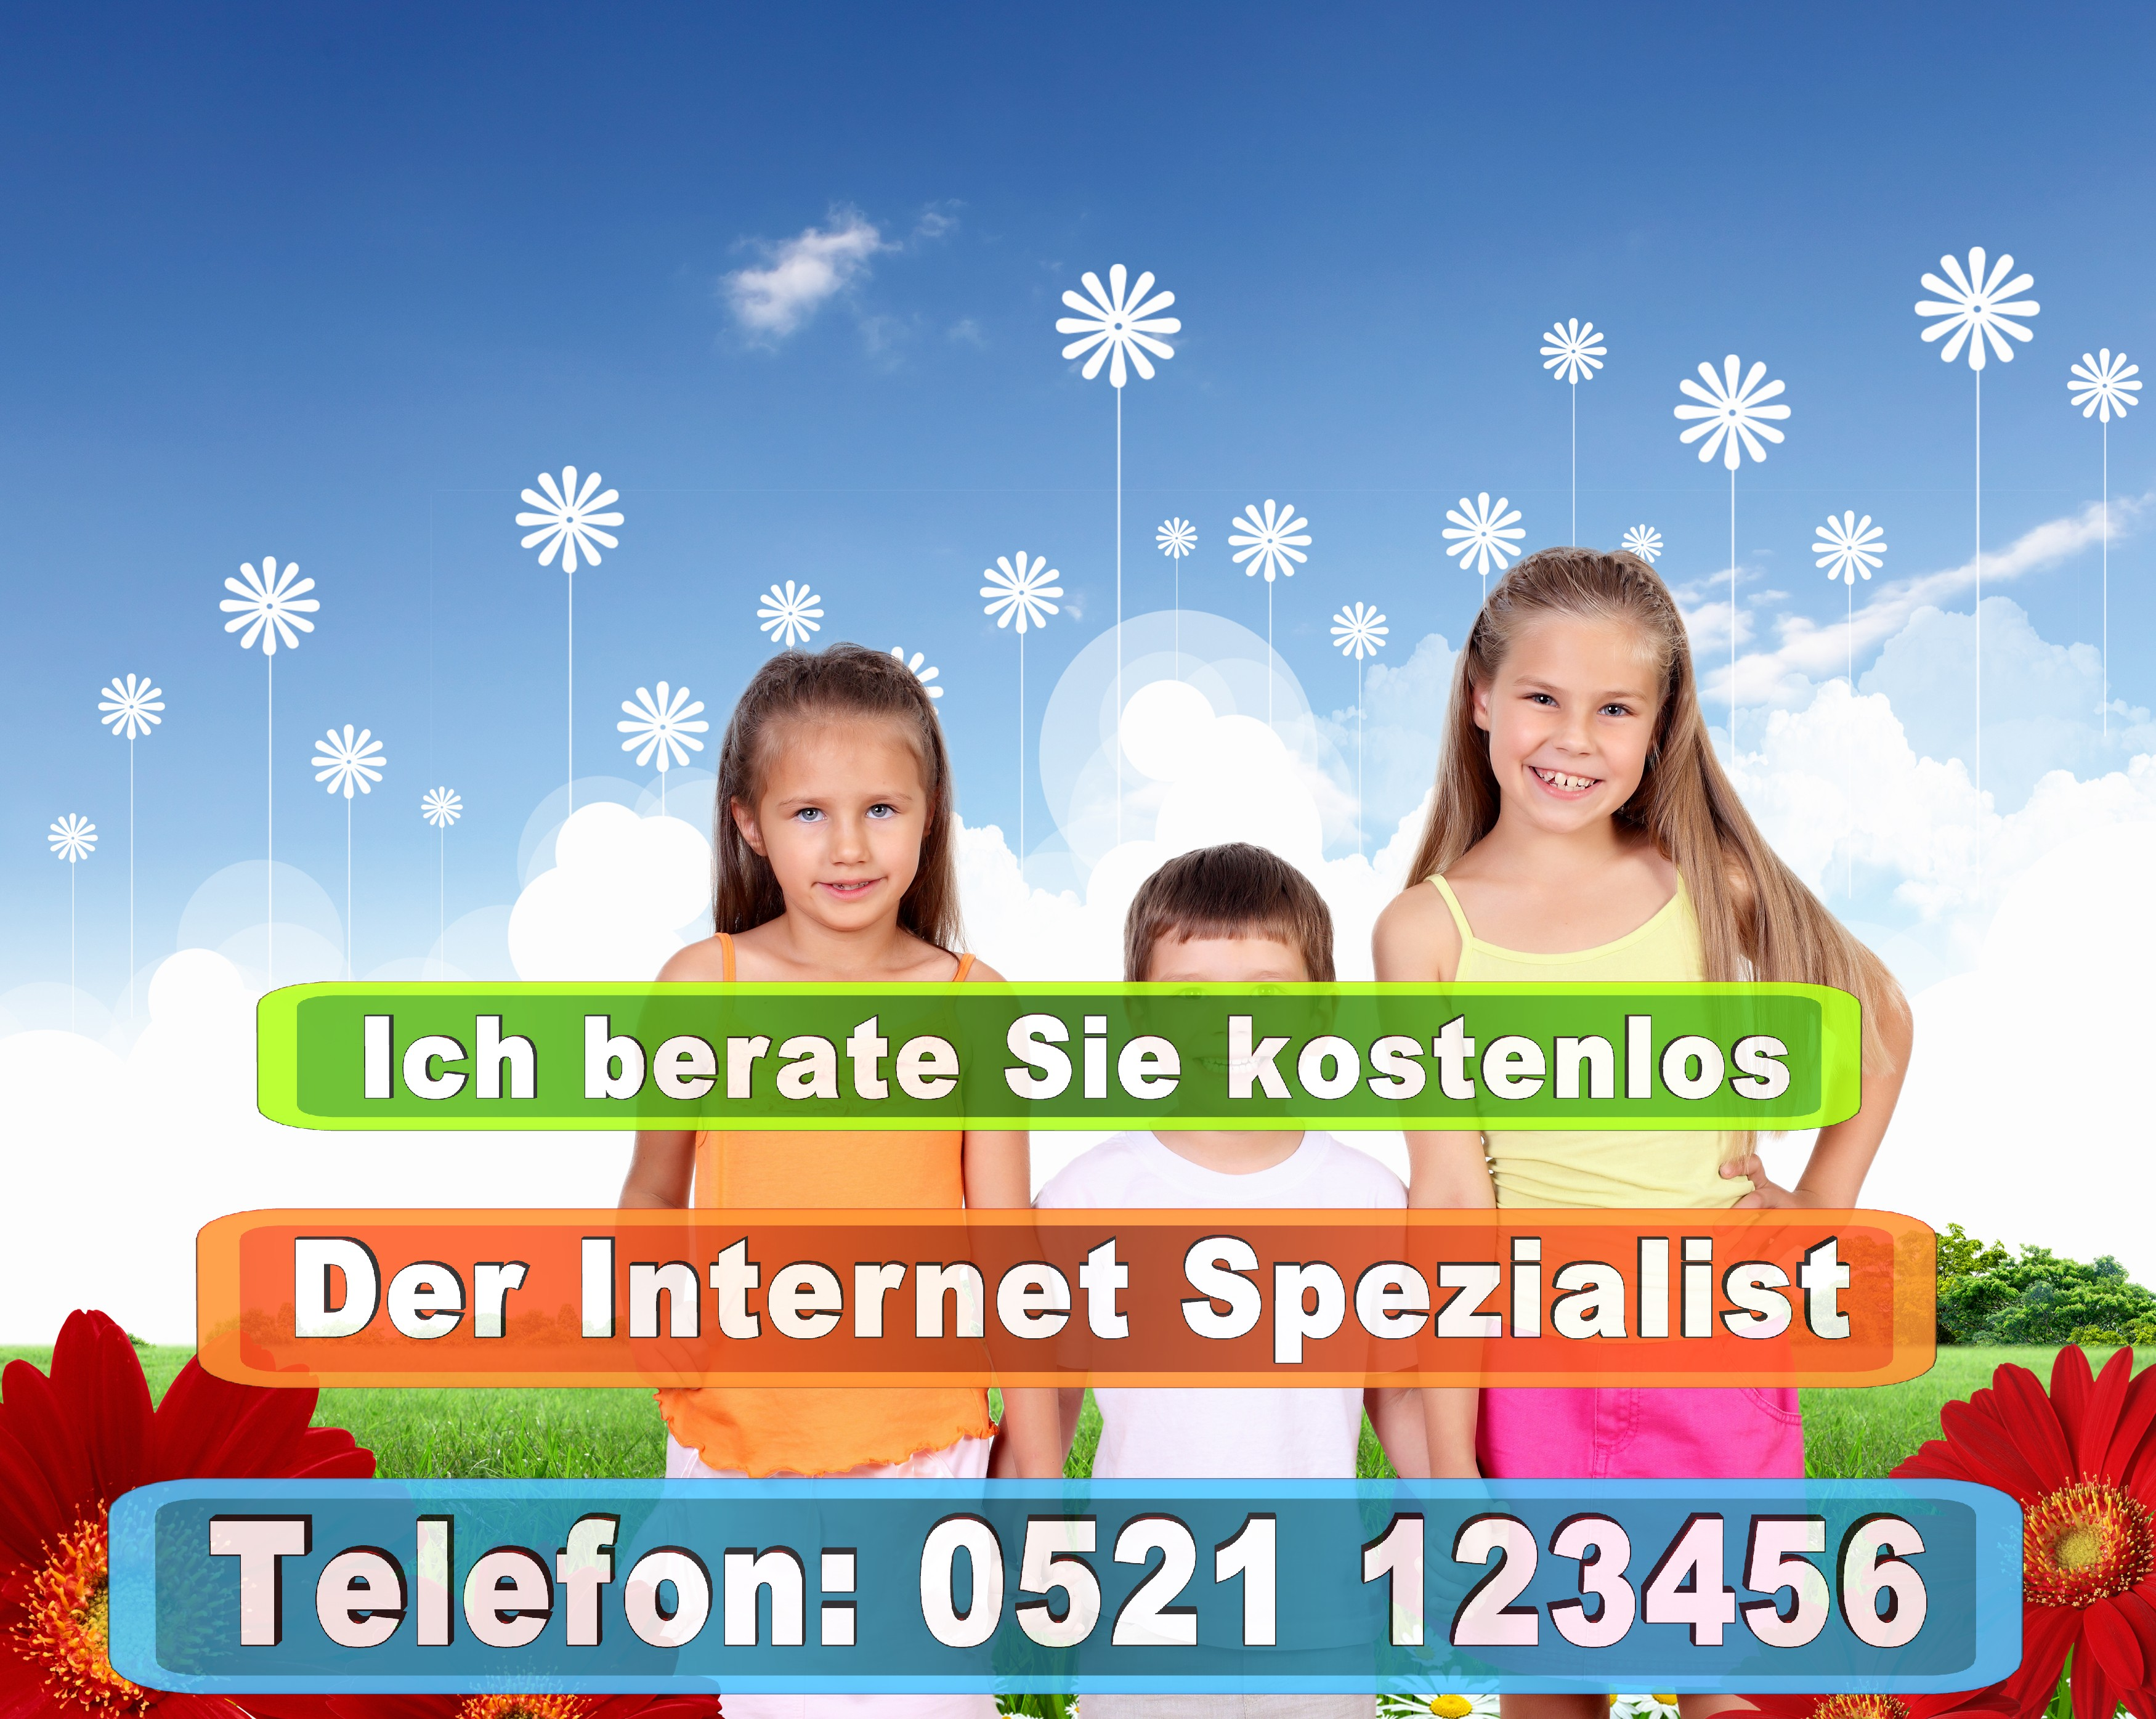 Schulen Bielefeld Schule Grundschule Sonderschule Hauptschule Realschule Schulhof Turnhalle Sporthalle Bielefeld NRW (9)